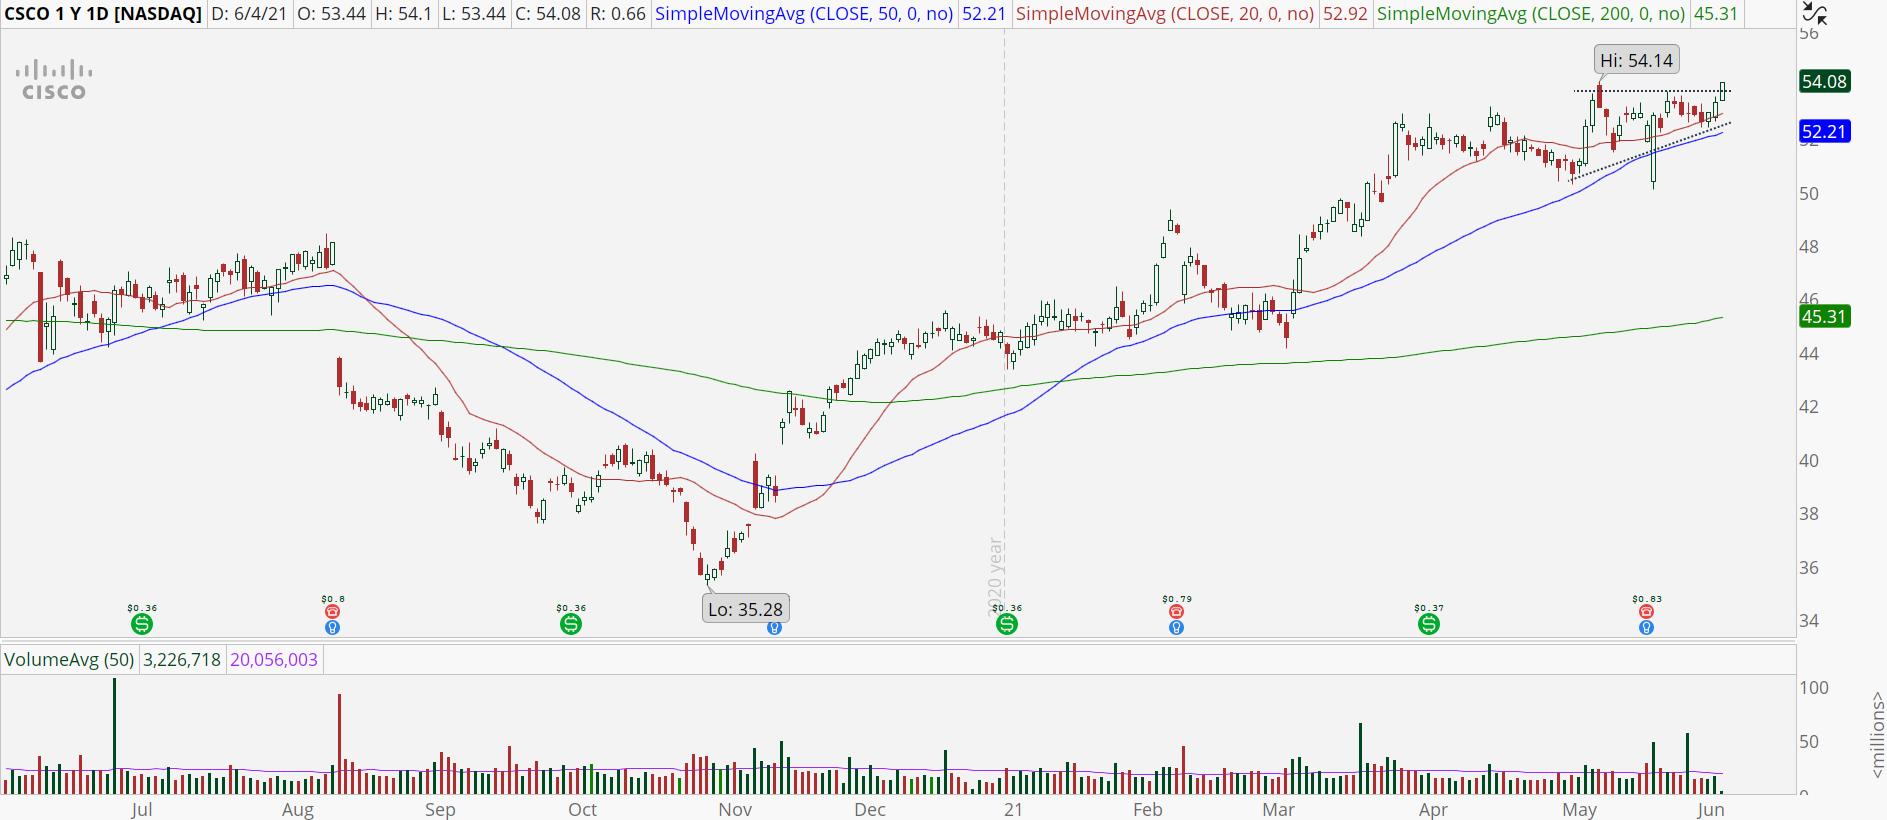 Cisco (CSCO) stock chart with bullish breakout pattern.